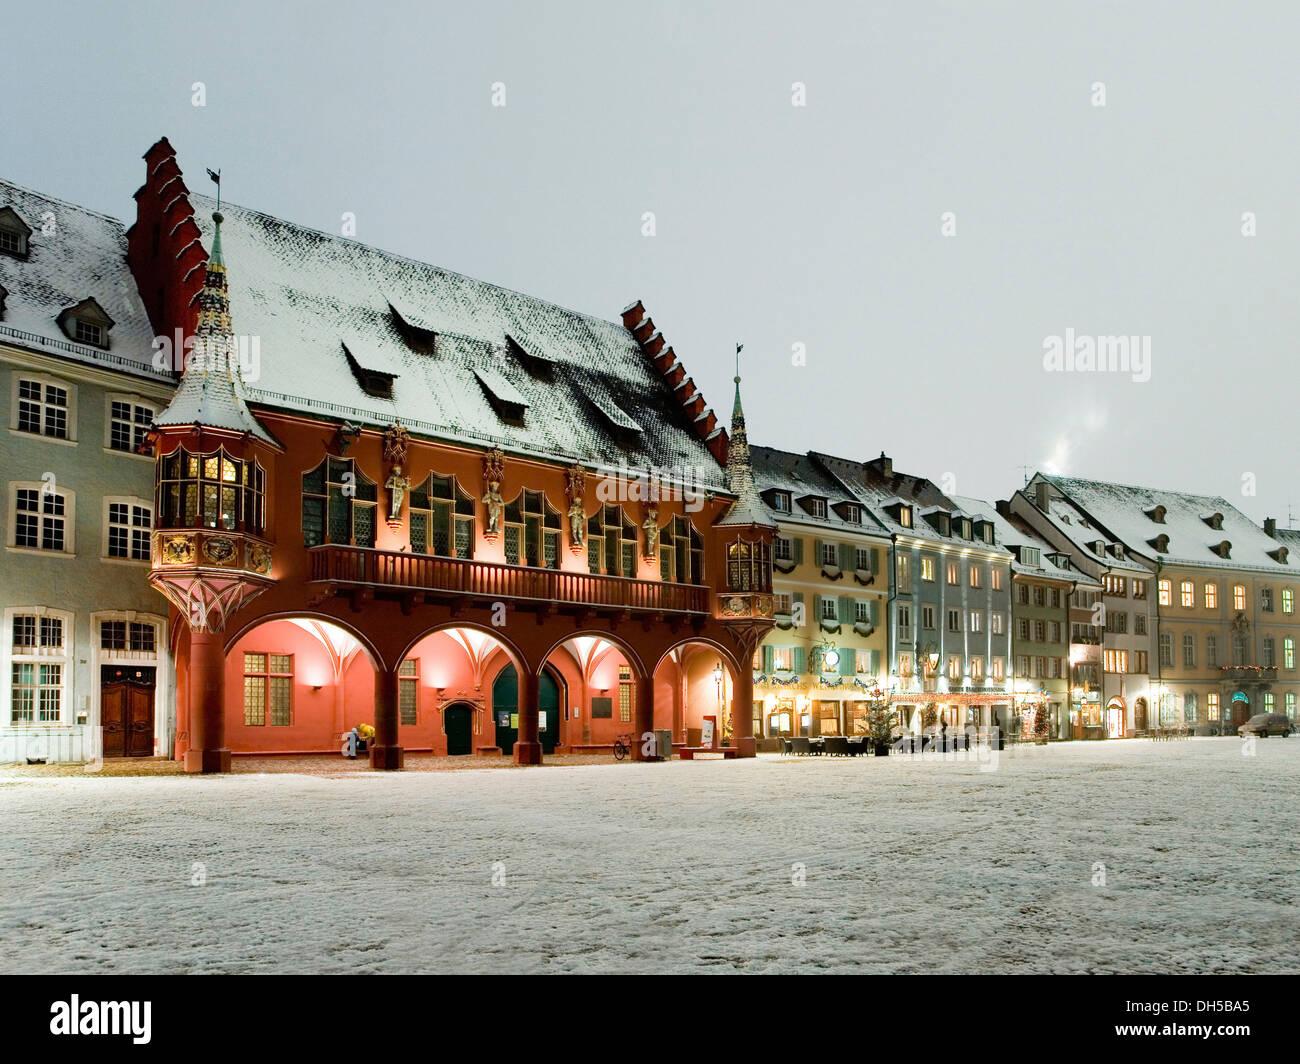 muensterplatz square in winter freiburg freiburg im breisgau stock photo royalty free image. Black Bedroom Furniture Sets. Home Design Ideas